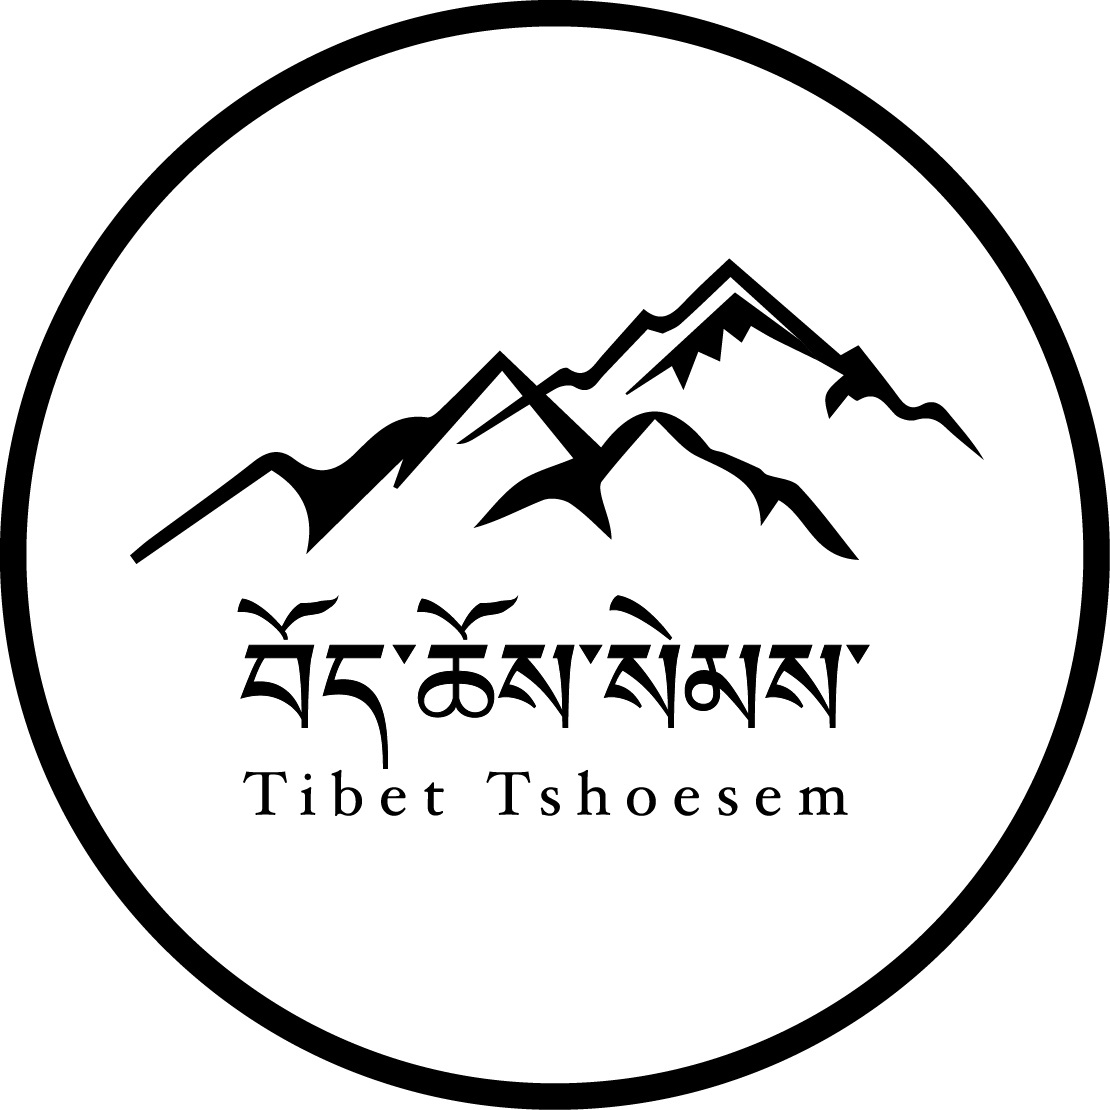 Tibet Tshoesem e. V.: Donate to our organisation